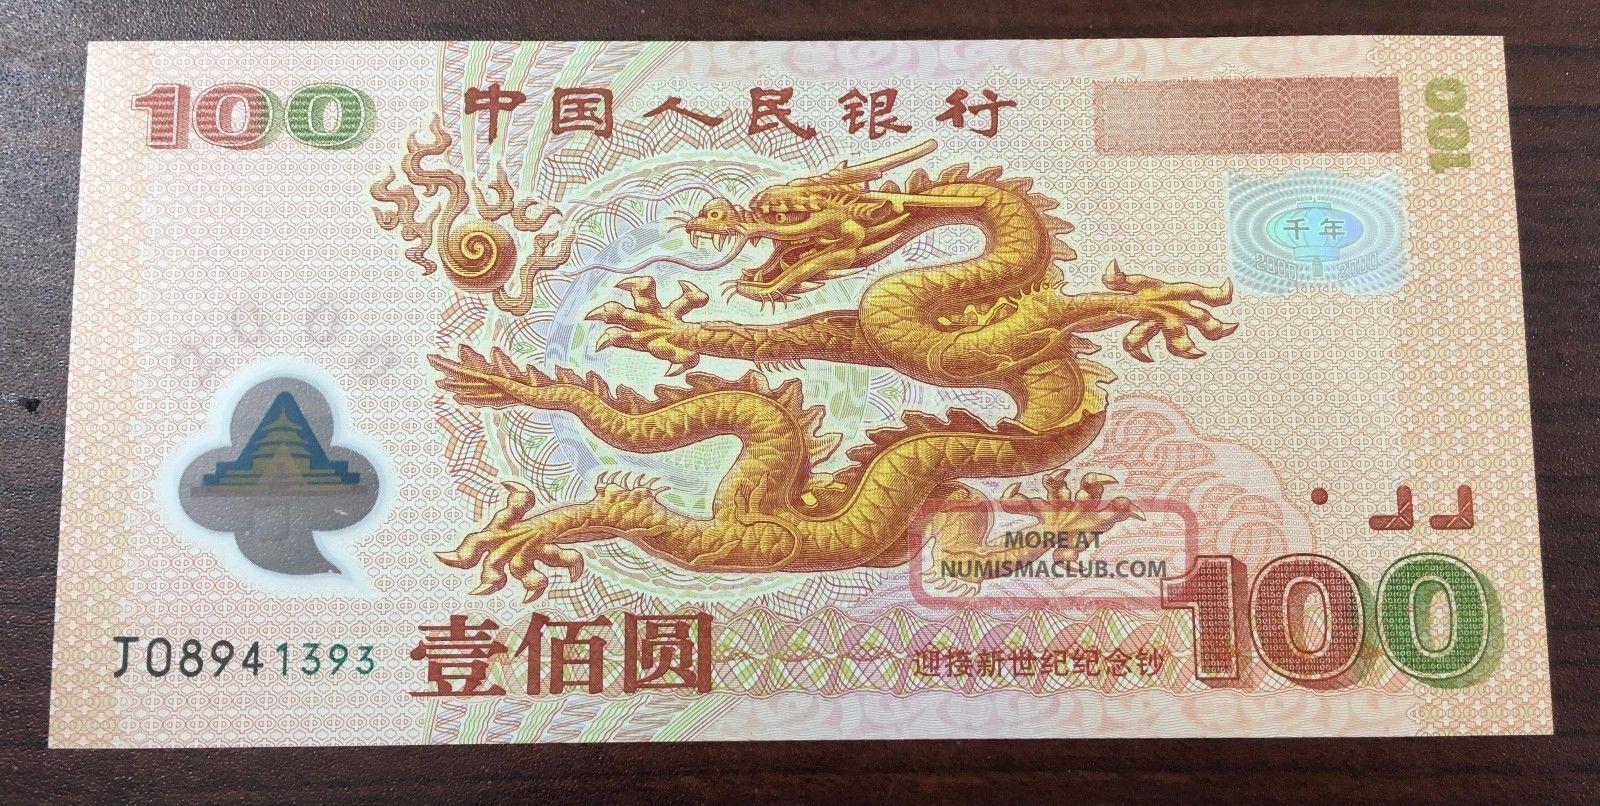 China 100 Yuan 2000 Polymer Unc P902 Millenniumcommemorative Asia photo